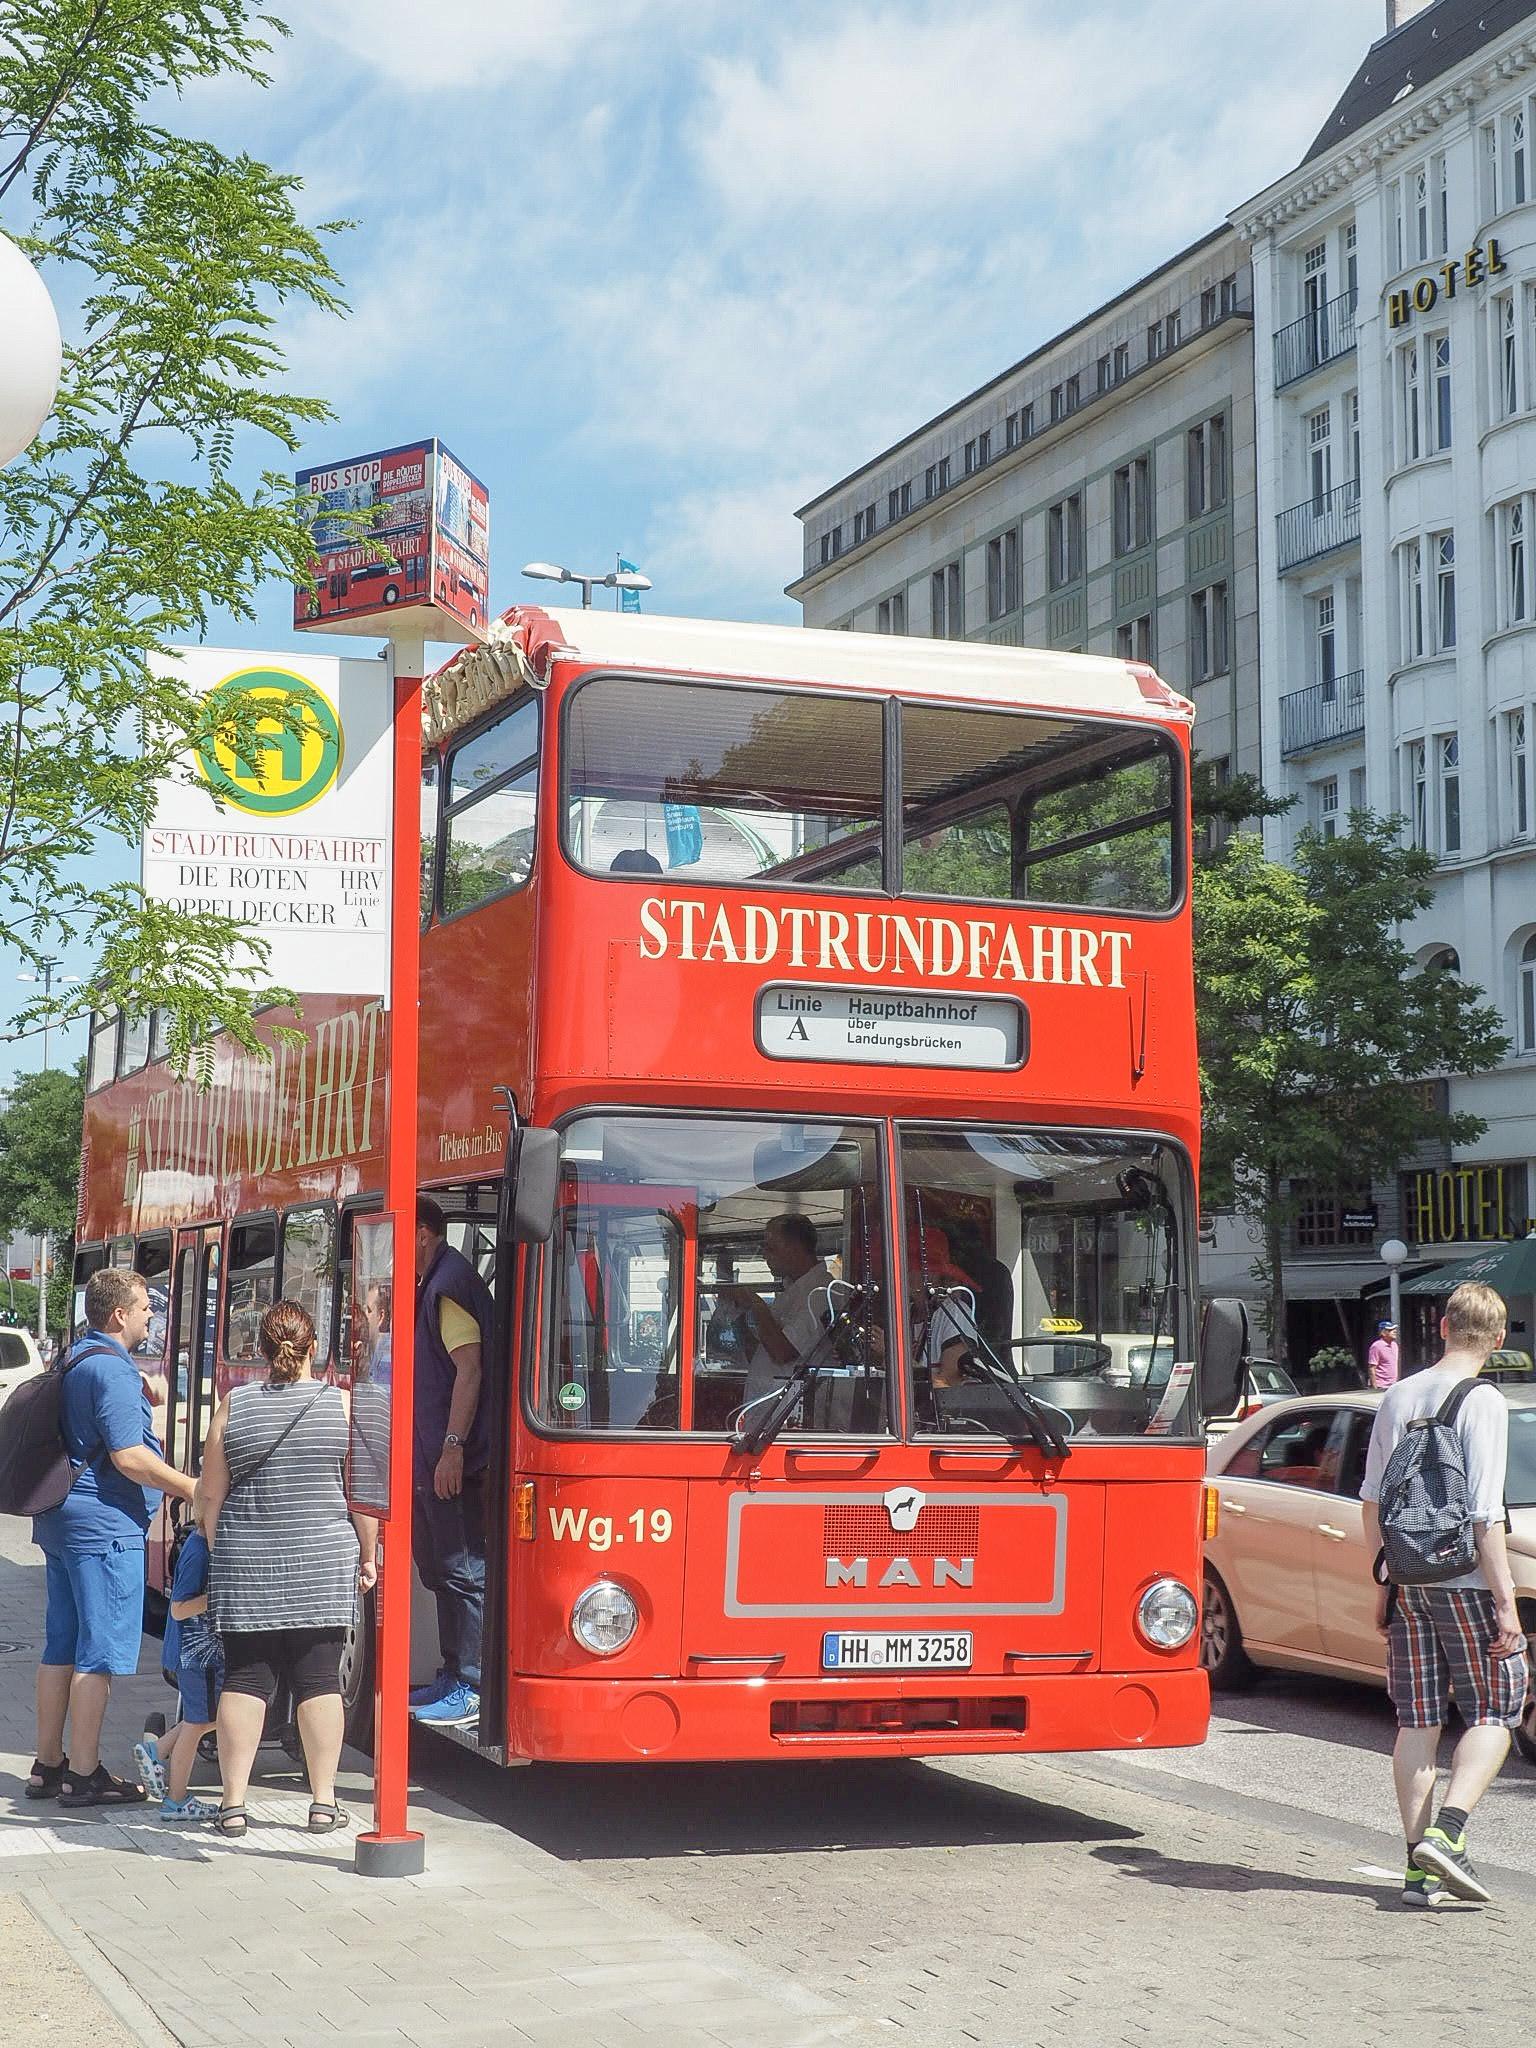 hamburg bus tour